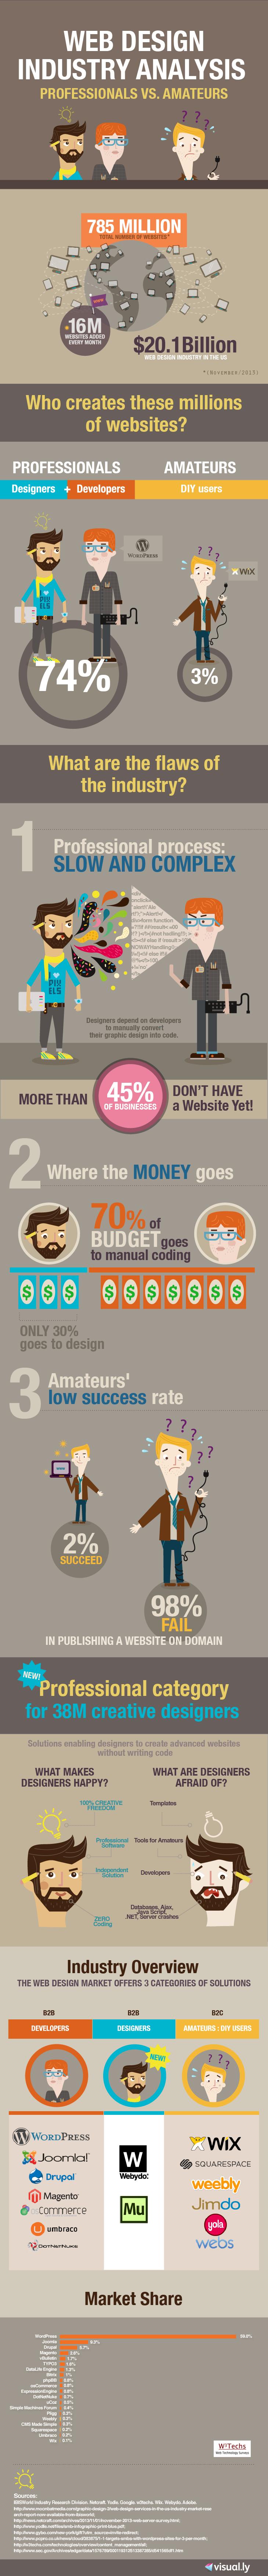 Webydo-Infographic